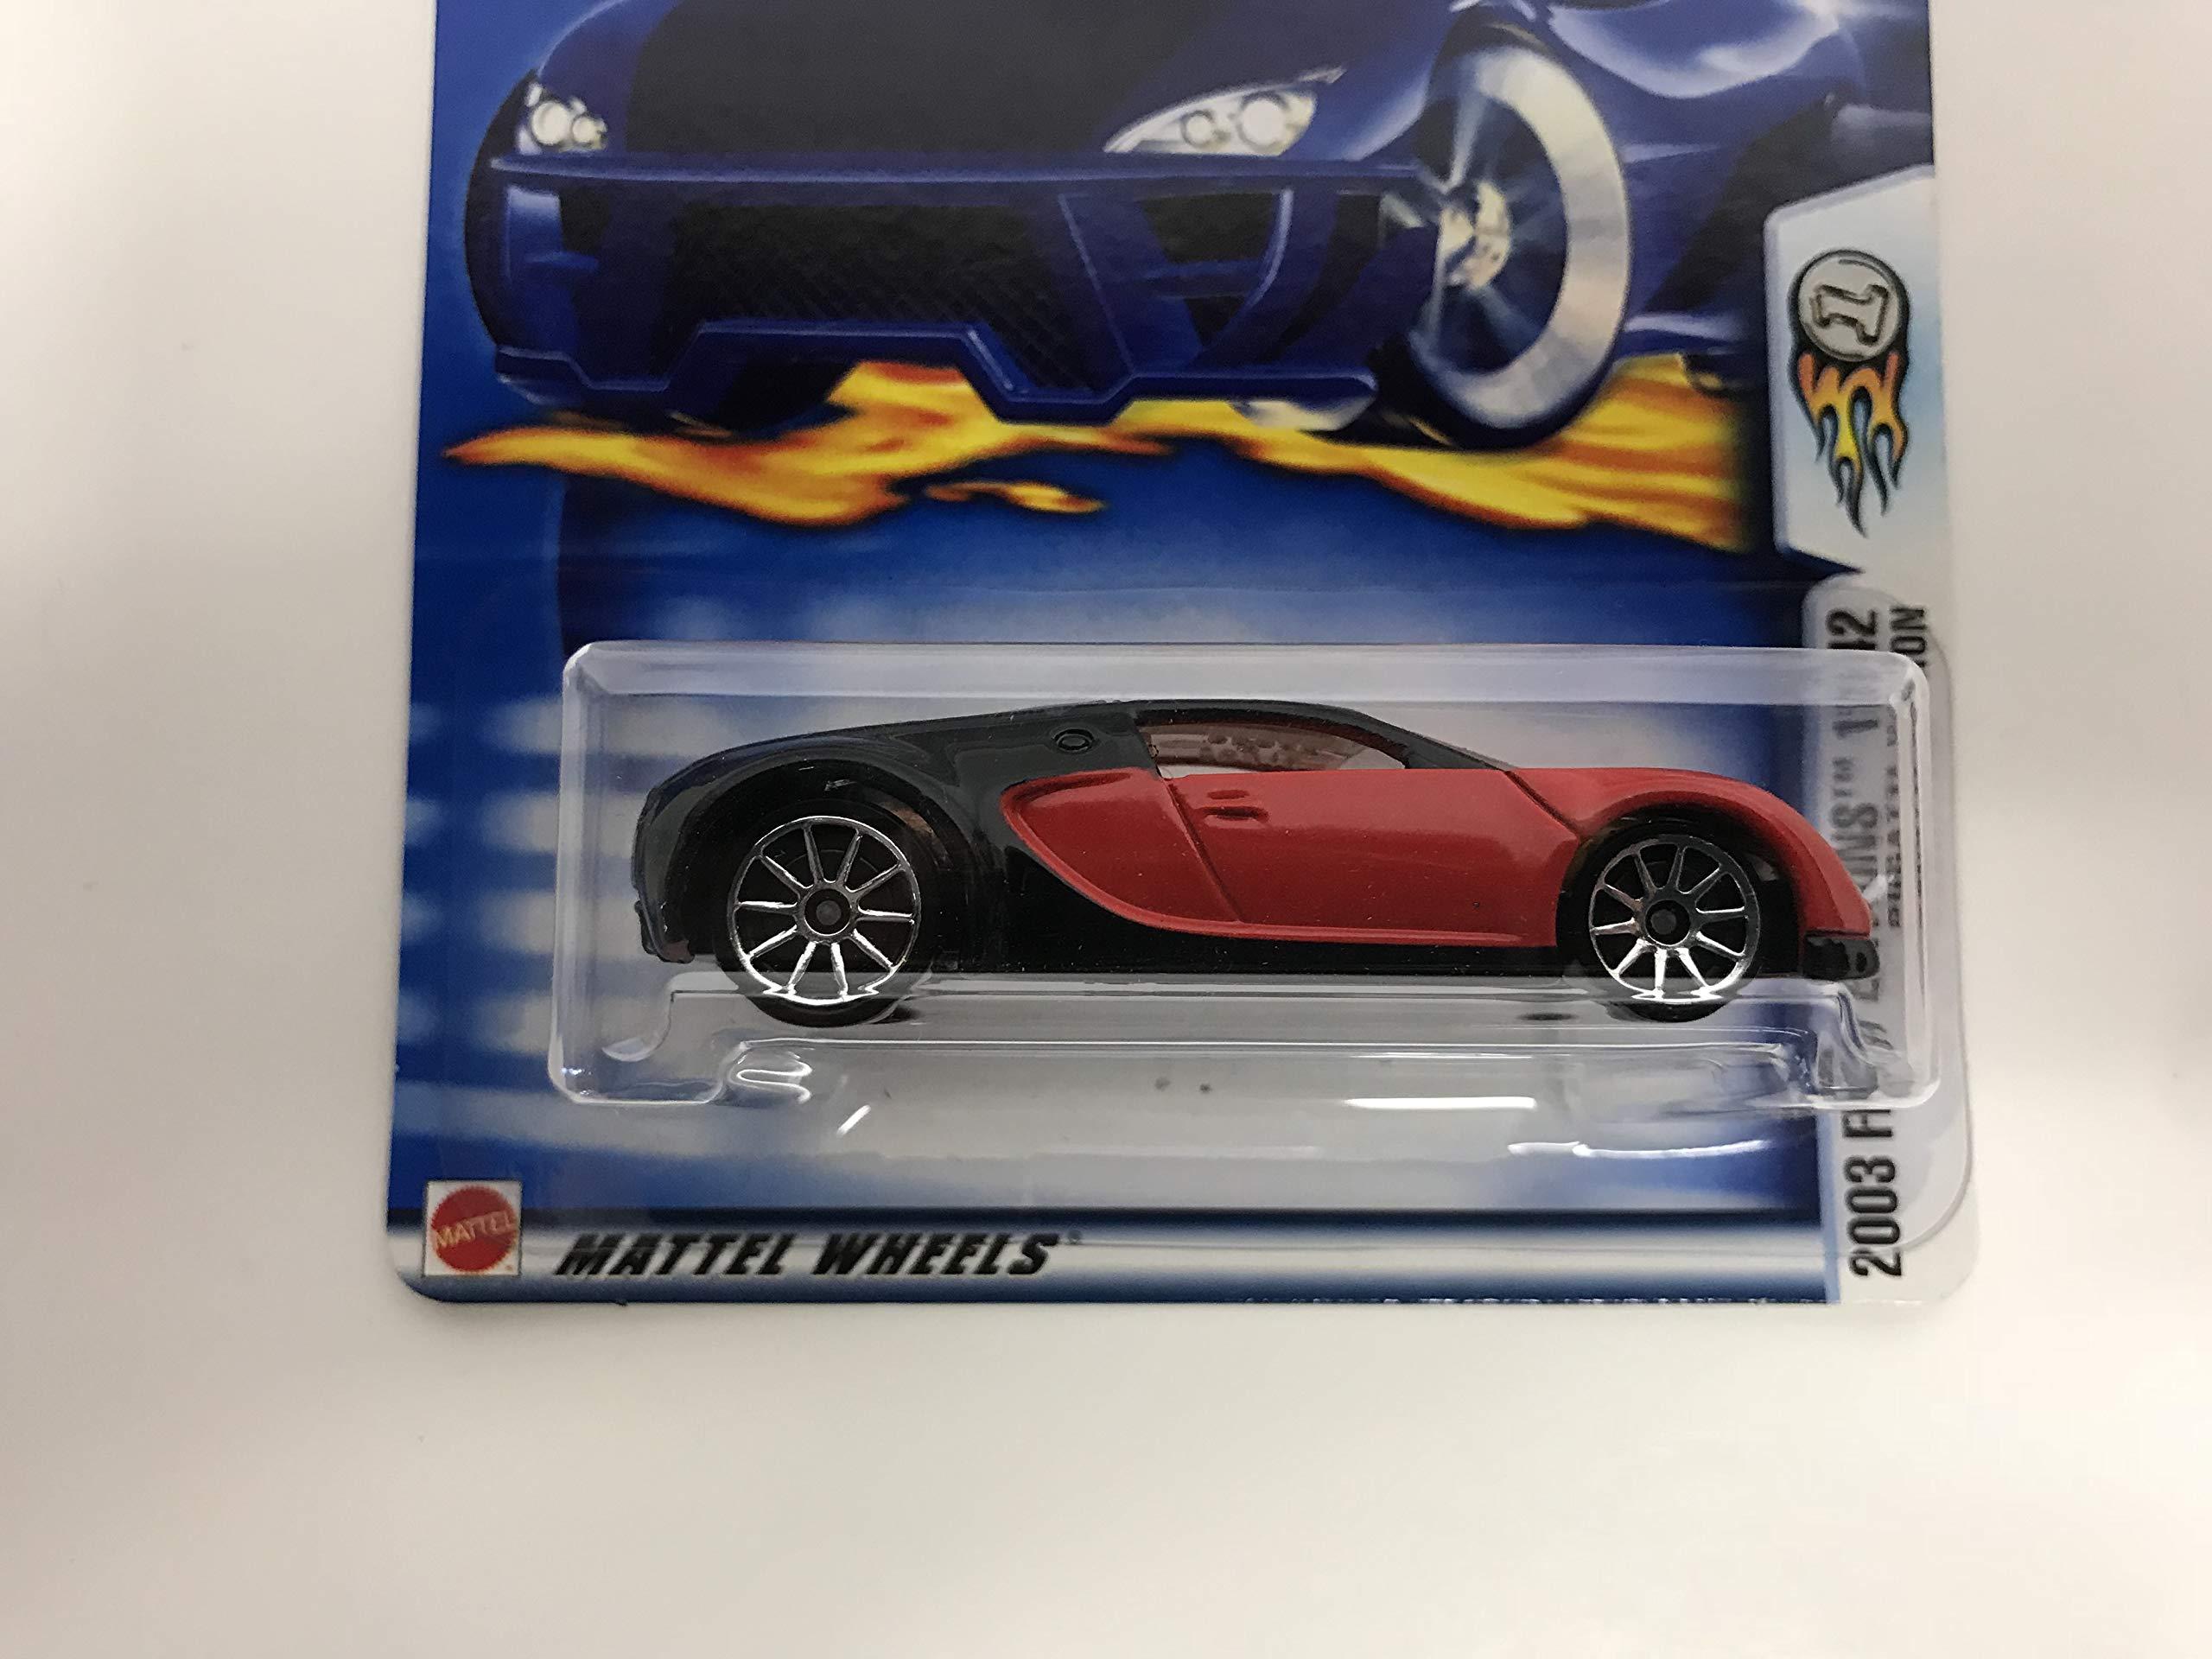 BUGATTI VEYRON Hot Wheels 2003 First Edition 18/42 Red/Black No. 30